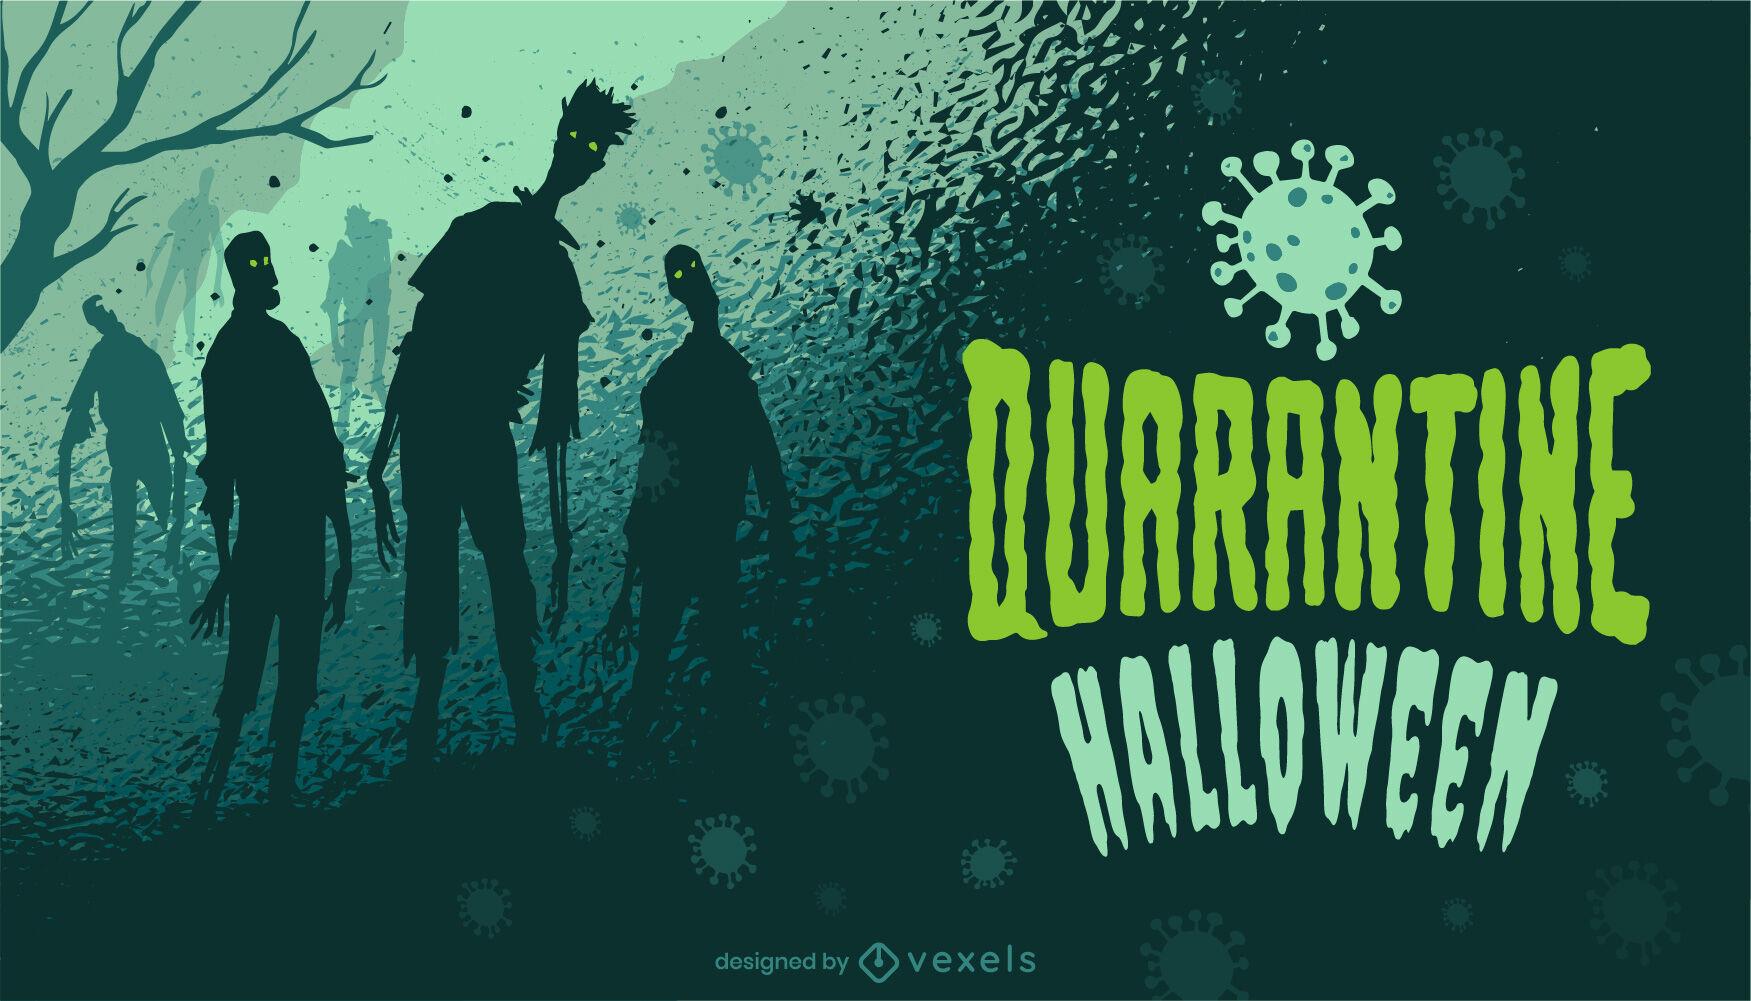 Quarantäne-Zombie-Halloween-Illustration